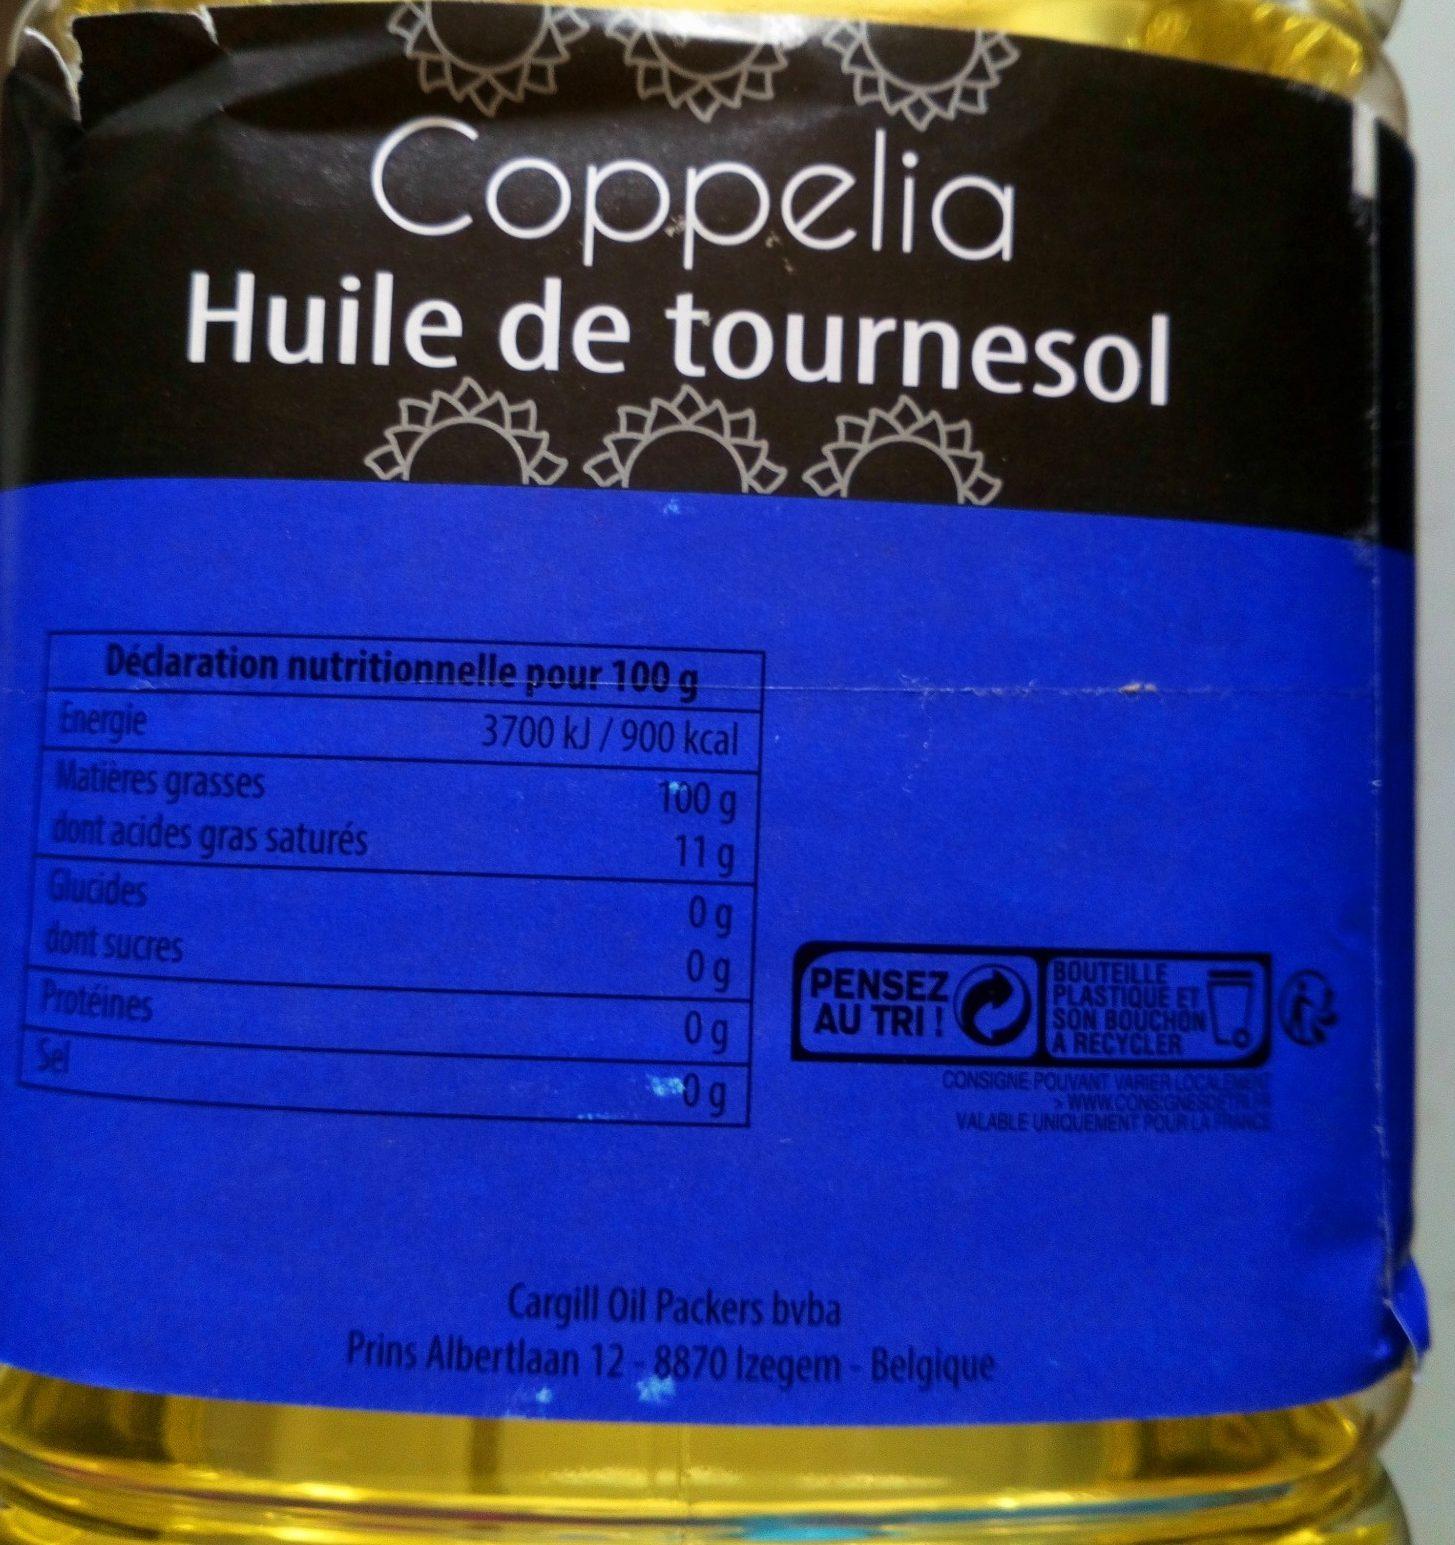 Huile de tournesol - Ingredients - fr